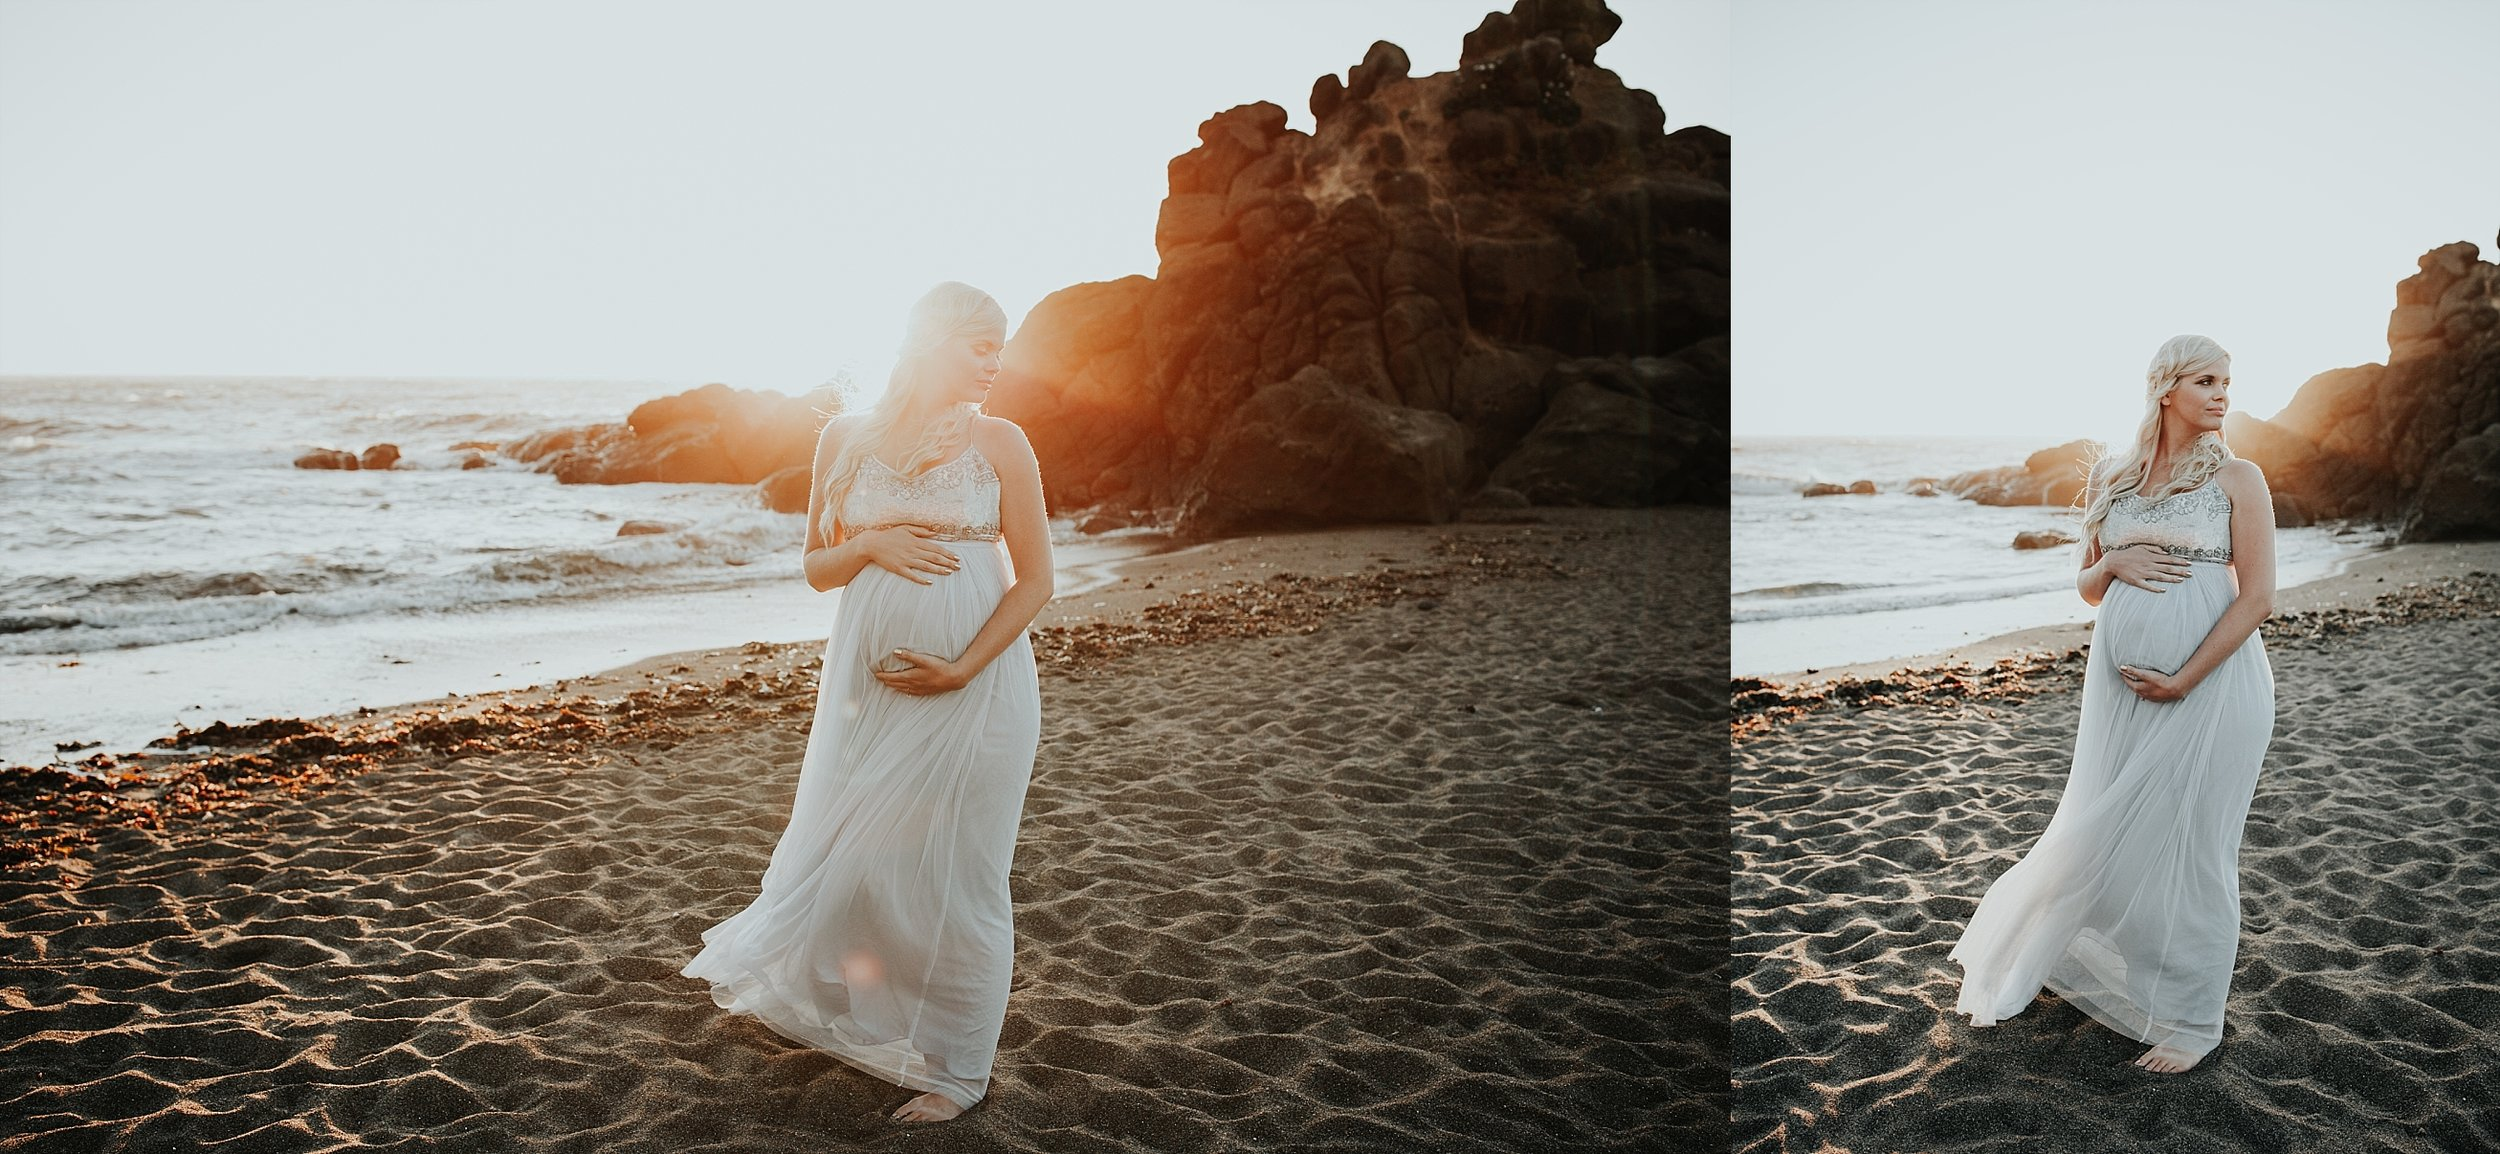 Lincoln CIty Oregon Coast Maternity Photographer (17).jpg